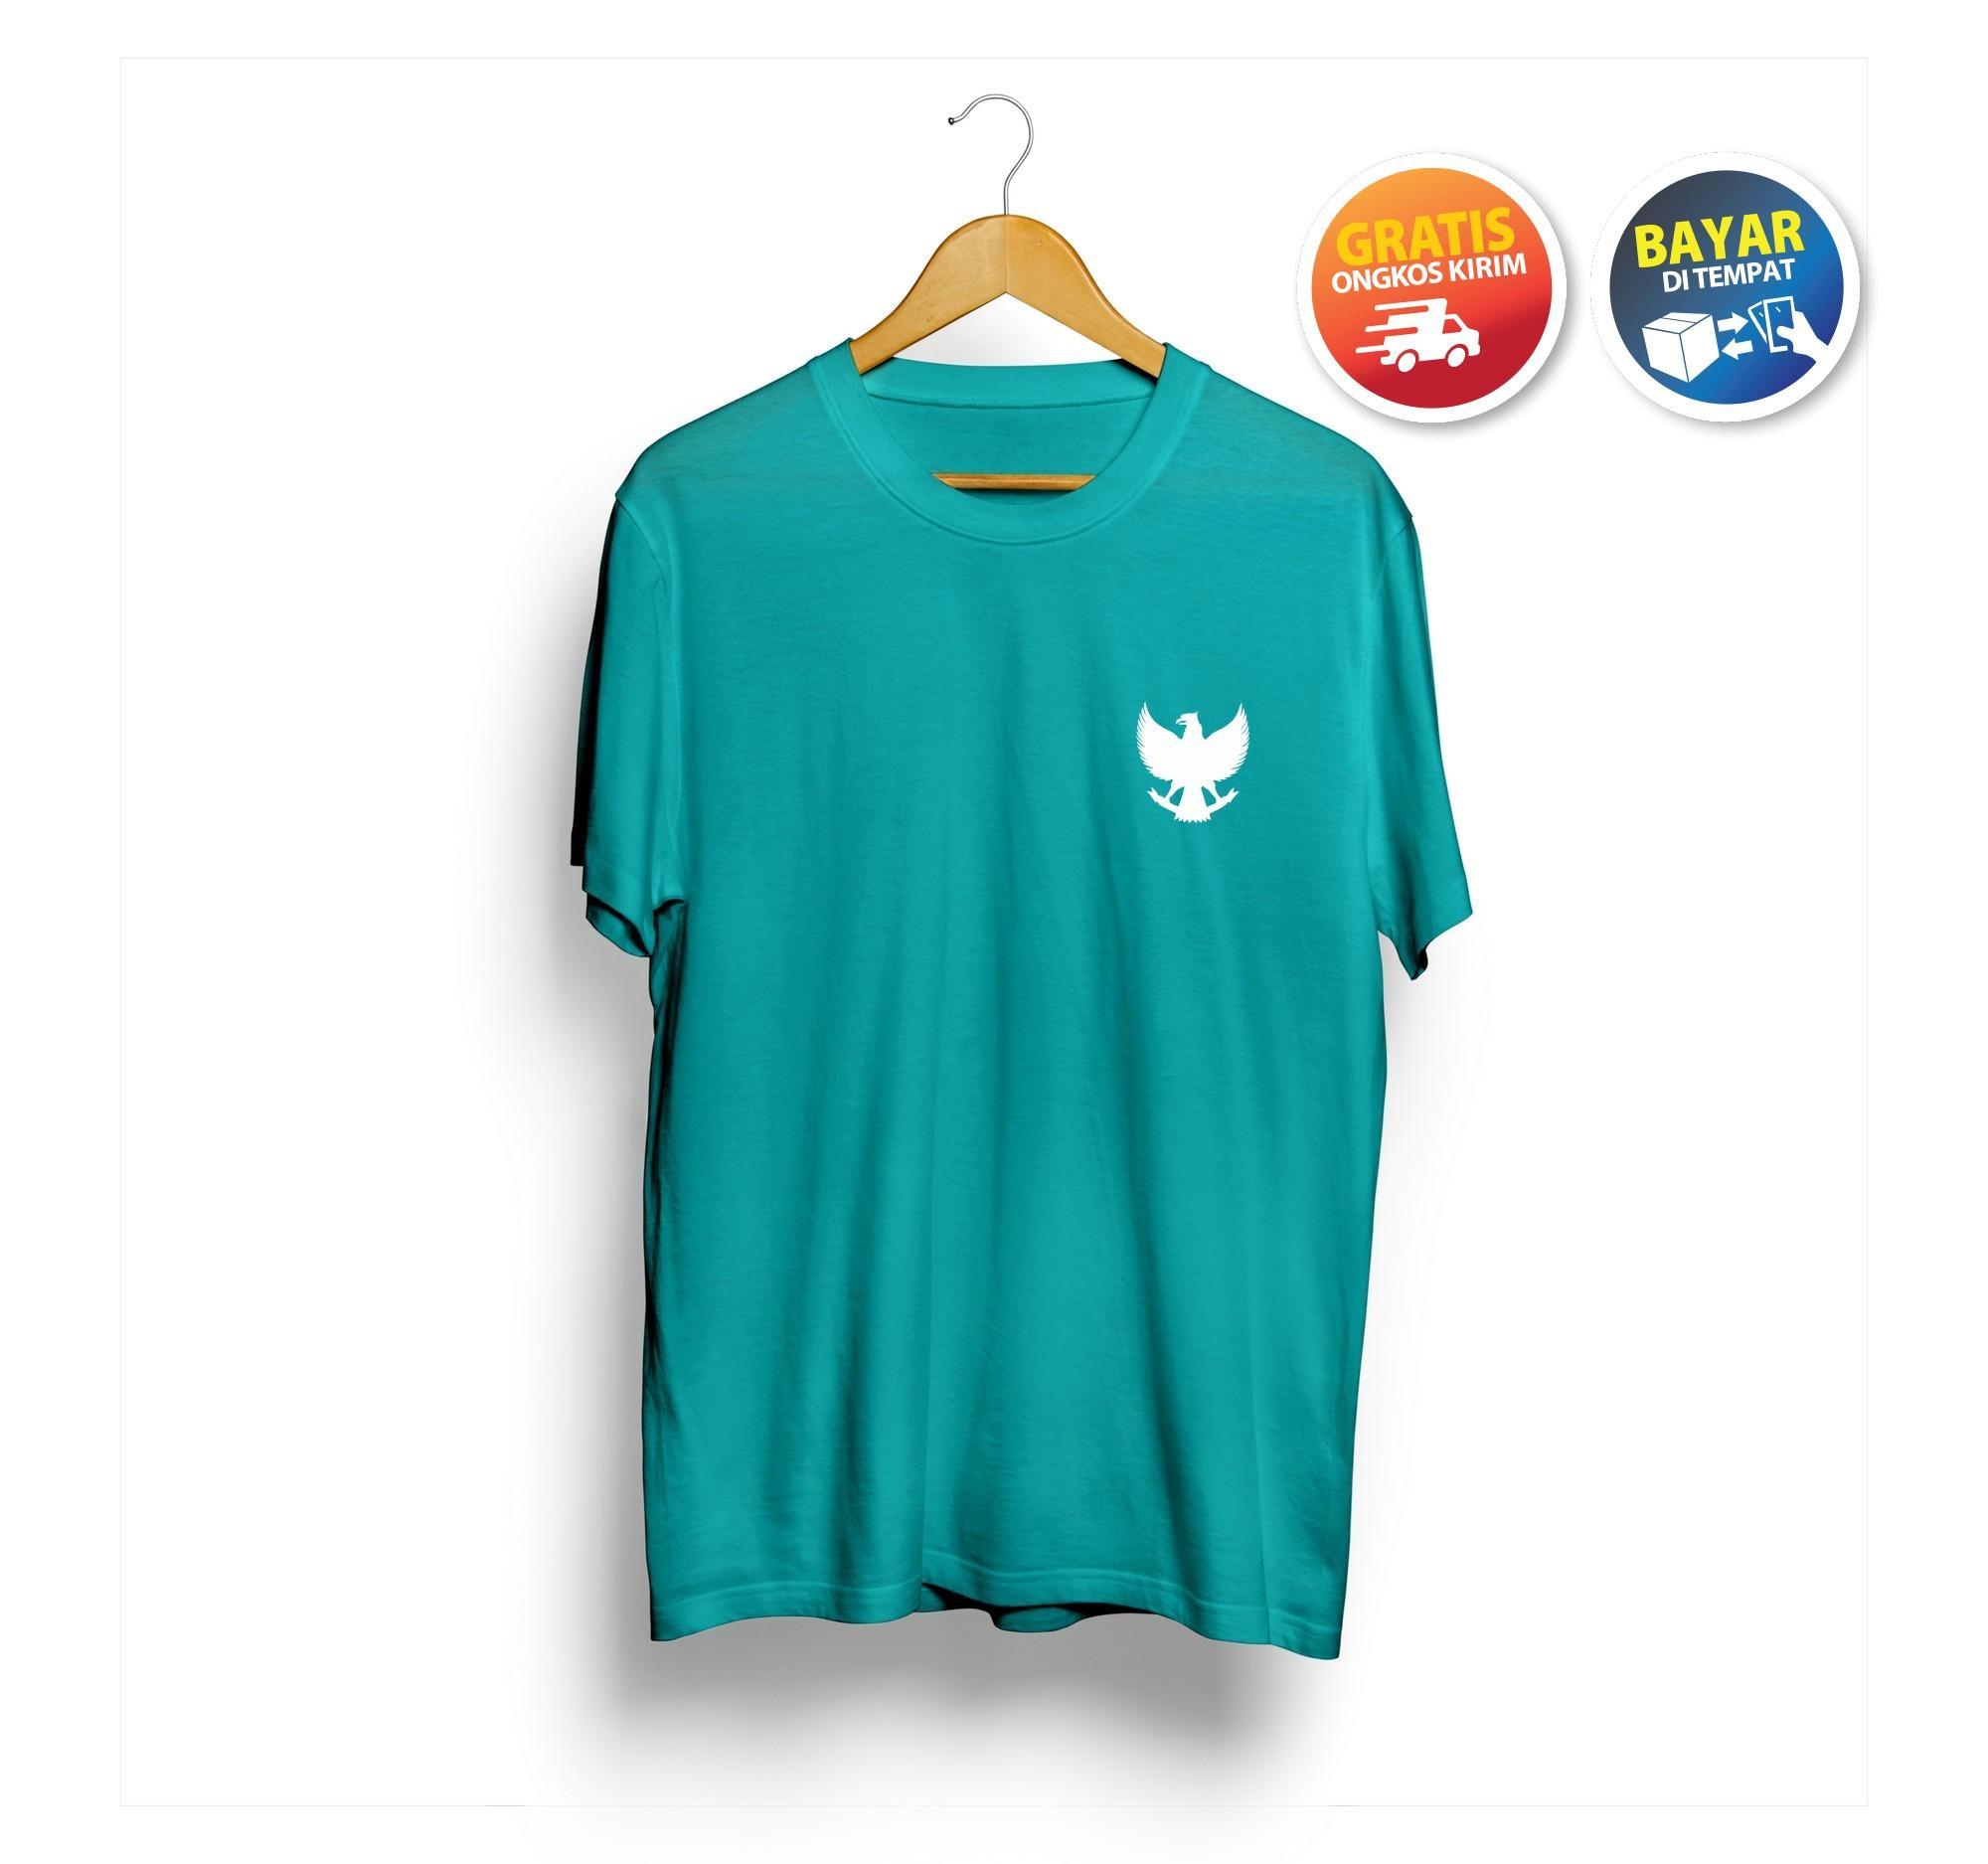 """Bibong T-Shirt Kaos Distro Polos Pria Lengan Pendek GARUDA atasan Murah wanita branded Original Premium Bandung"""